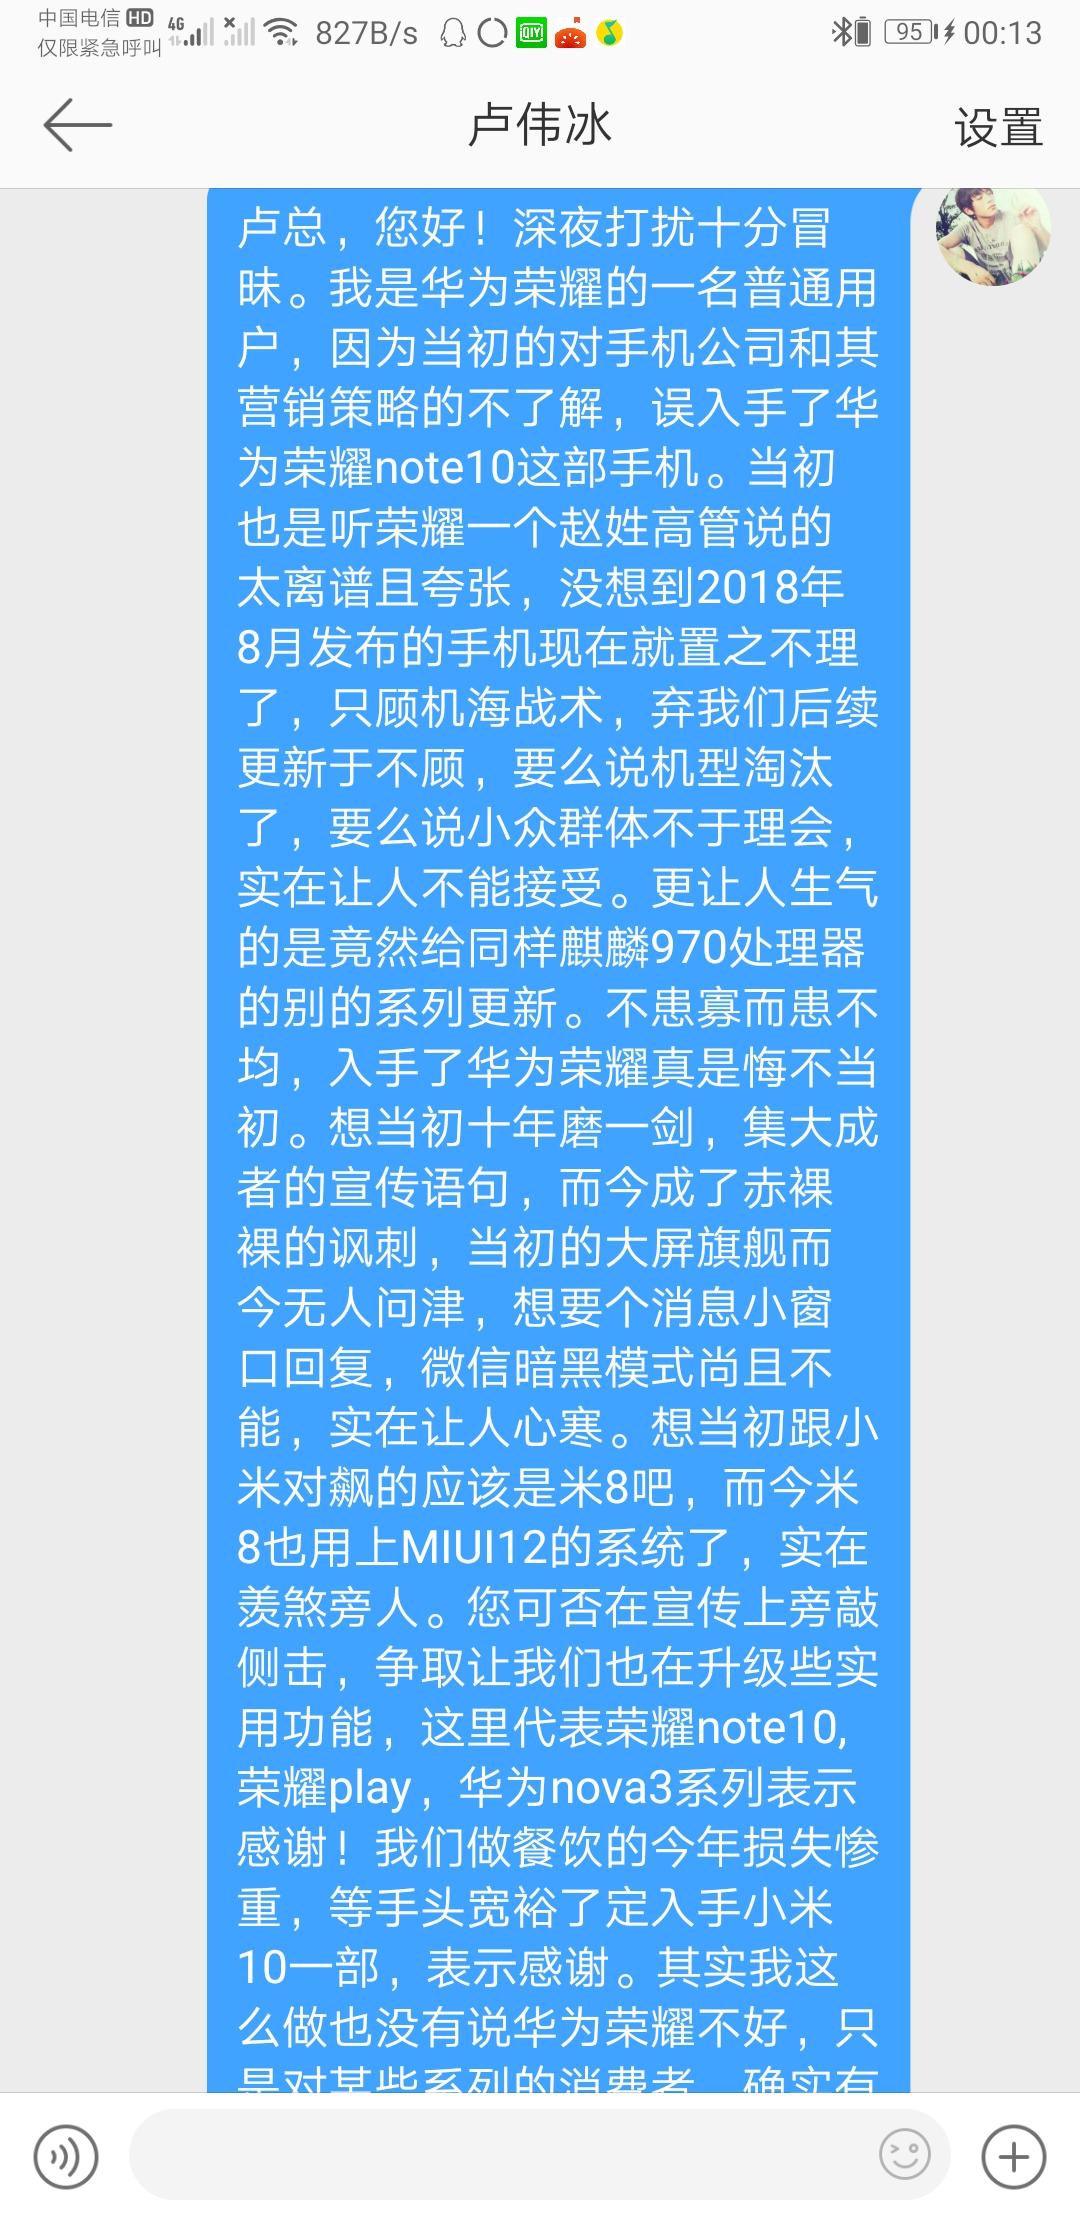 Screenshot_20200516_001320_com.sina.weibo.jpg